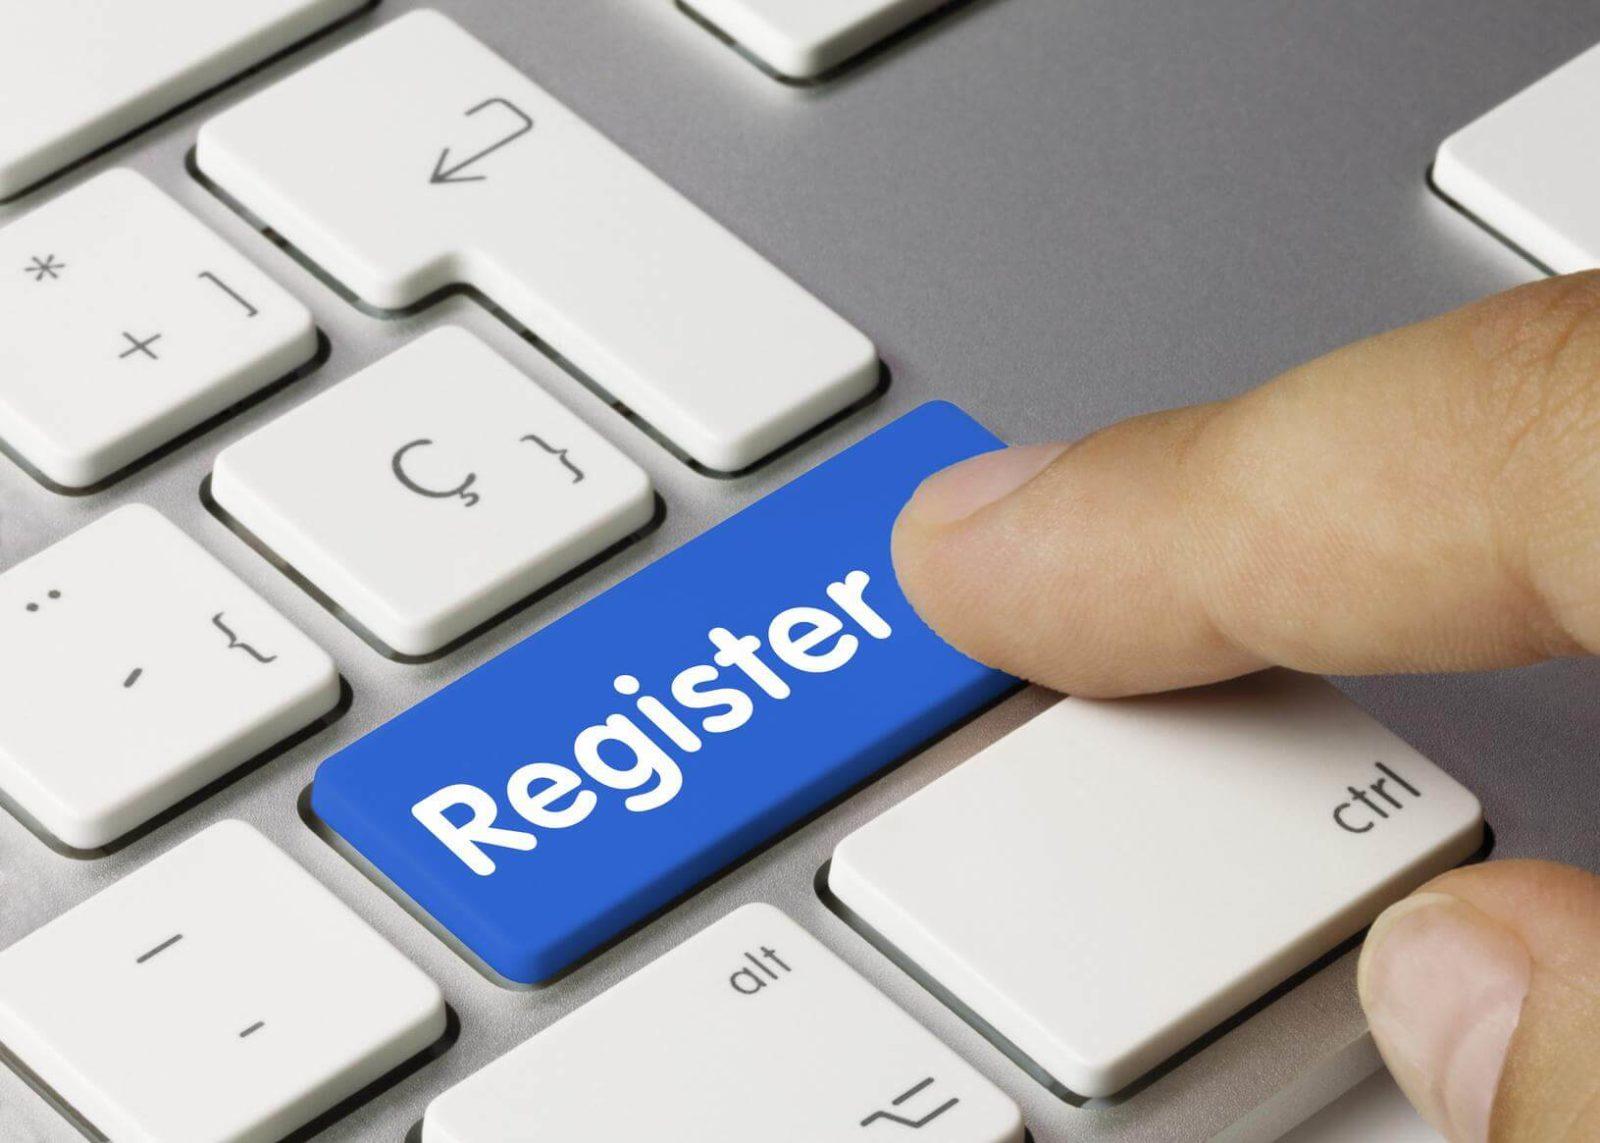 Регистрация на сервисах облачного майнинга